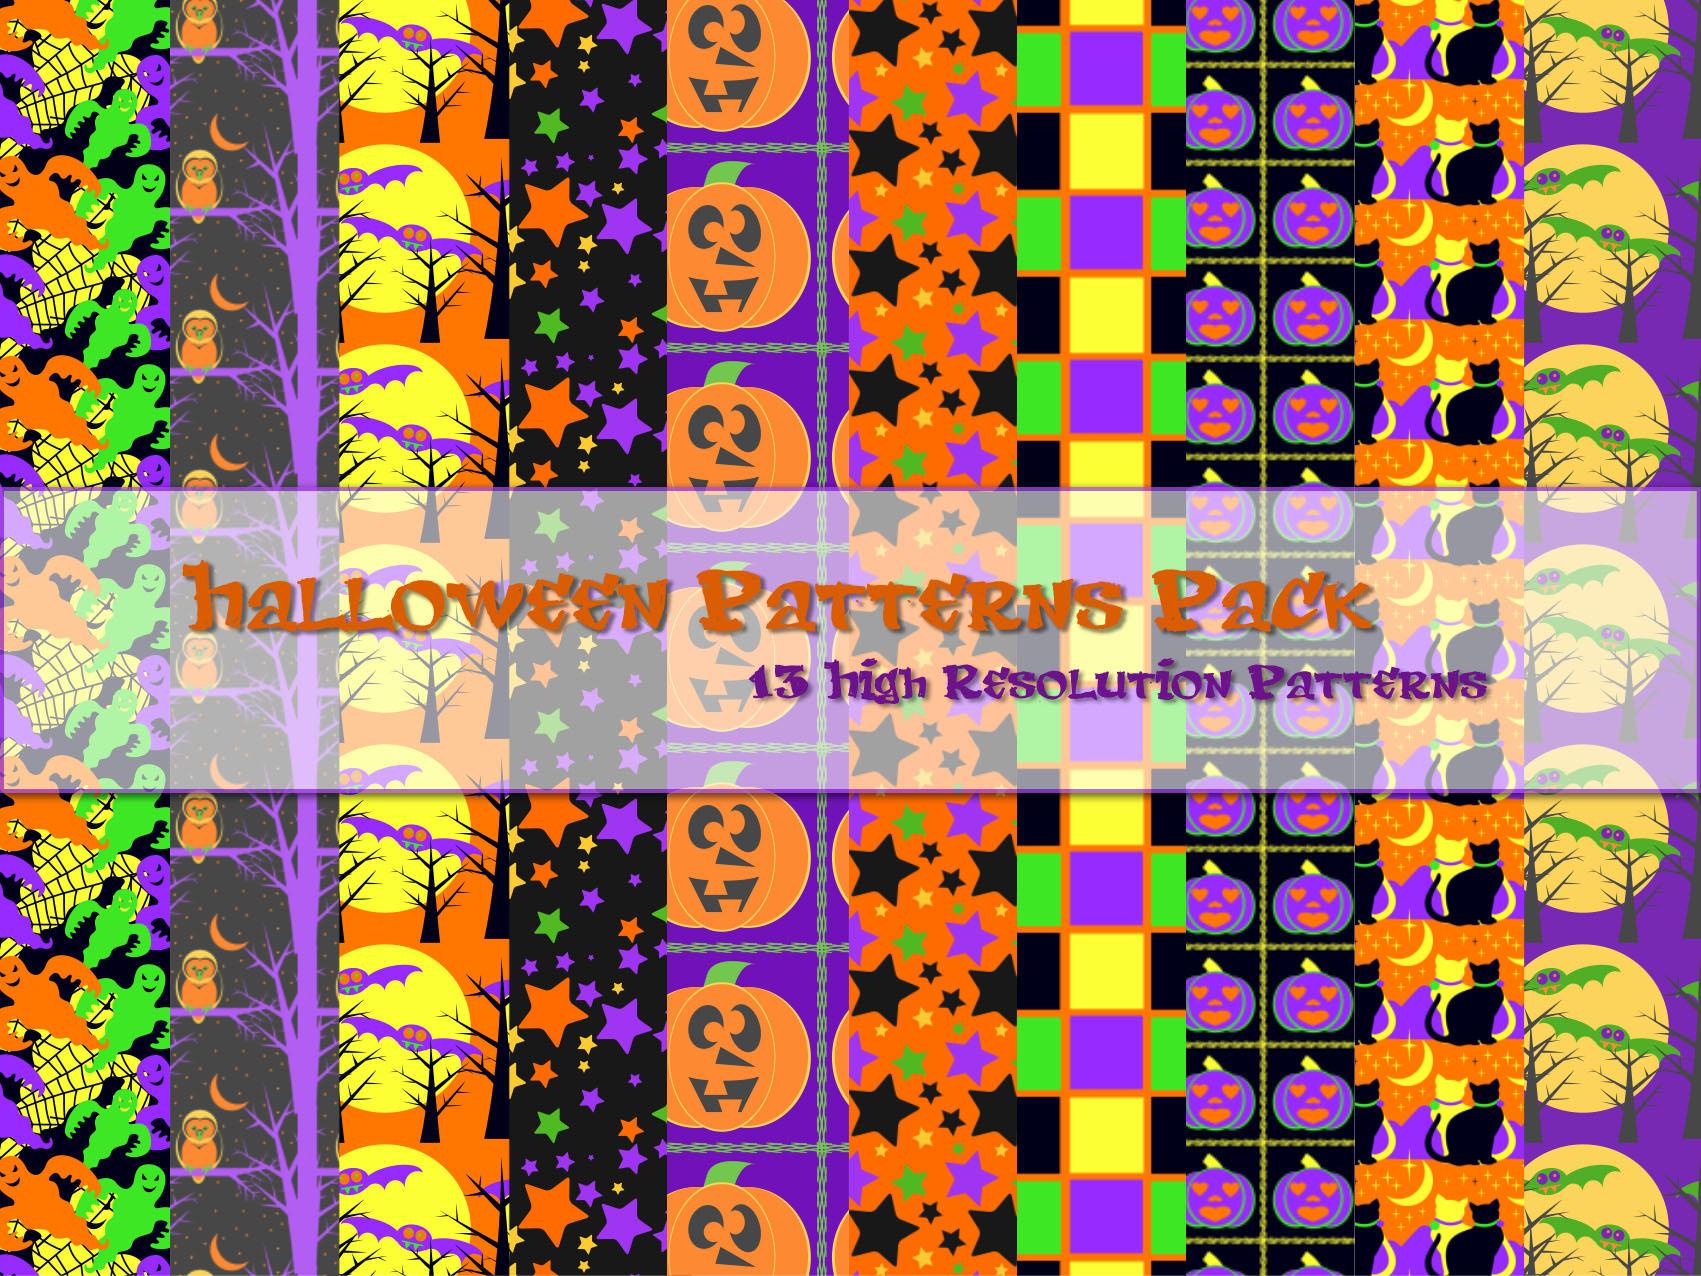 Halloween Patterns Pack by powerpuffjazz